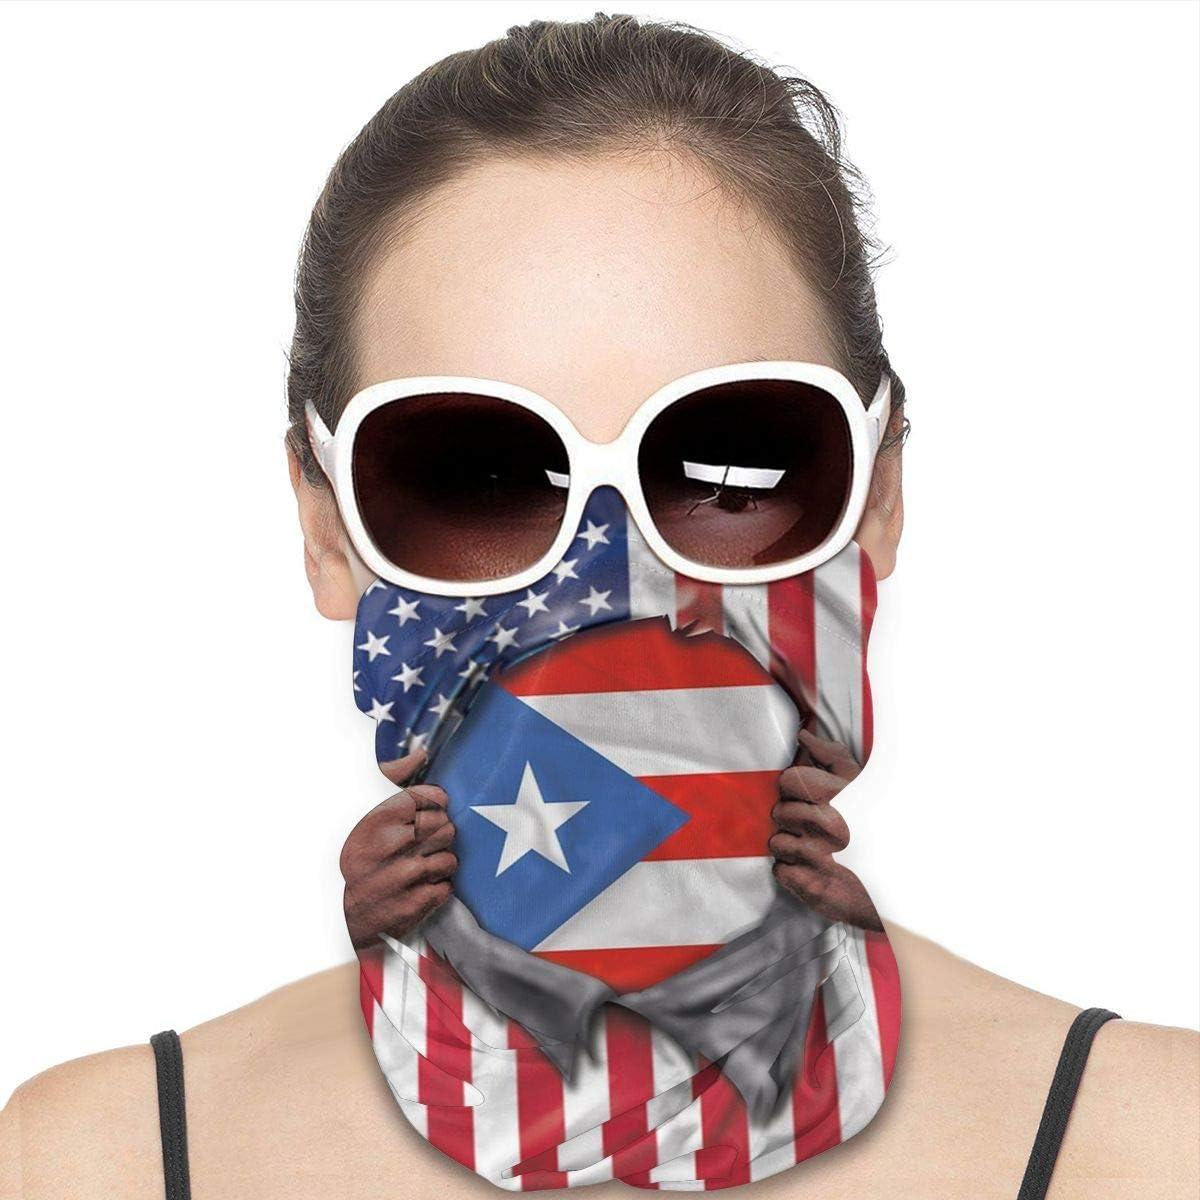 JinSPef Motorcycle Masks for Men - Puerto Rico Flag American Flag Ripped Motorcycle Mask Fishing Multifunctional Headwear Head Bands Sport Mask Headbands Face Mask Bandana